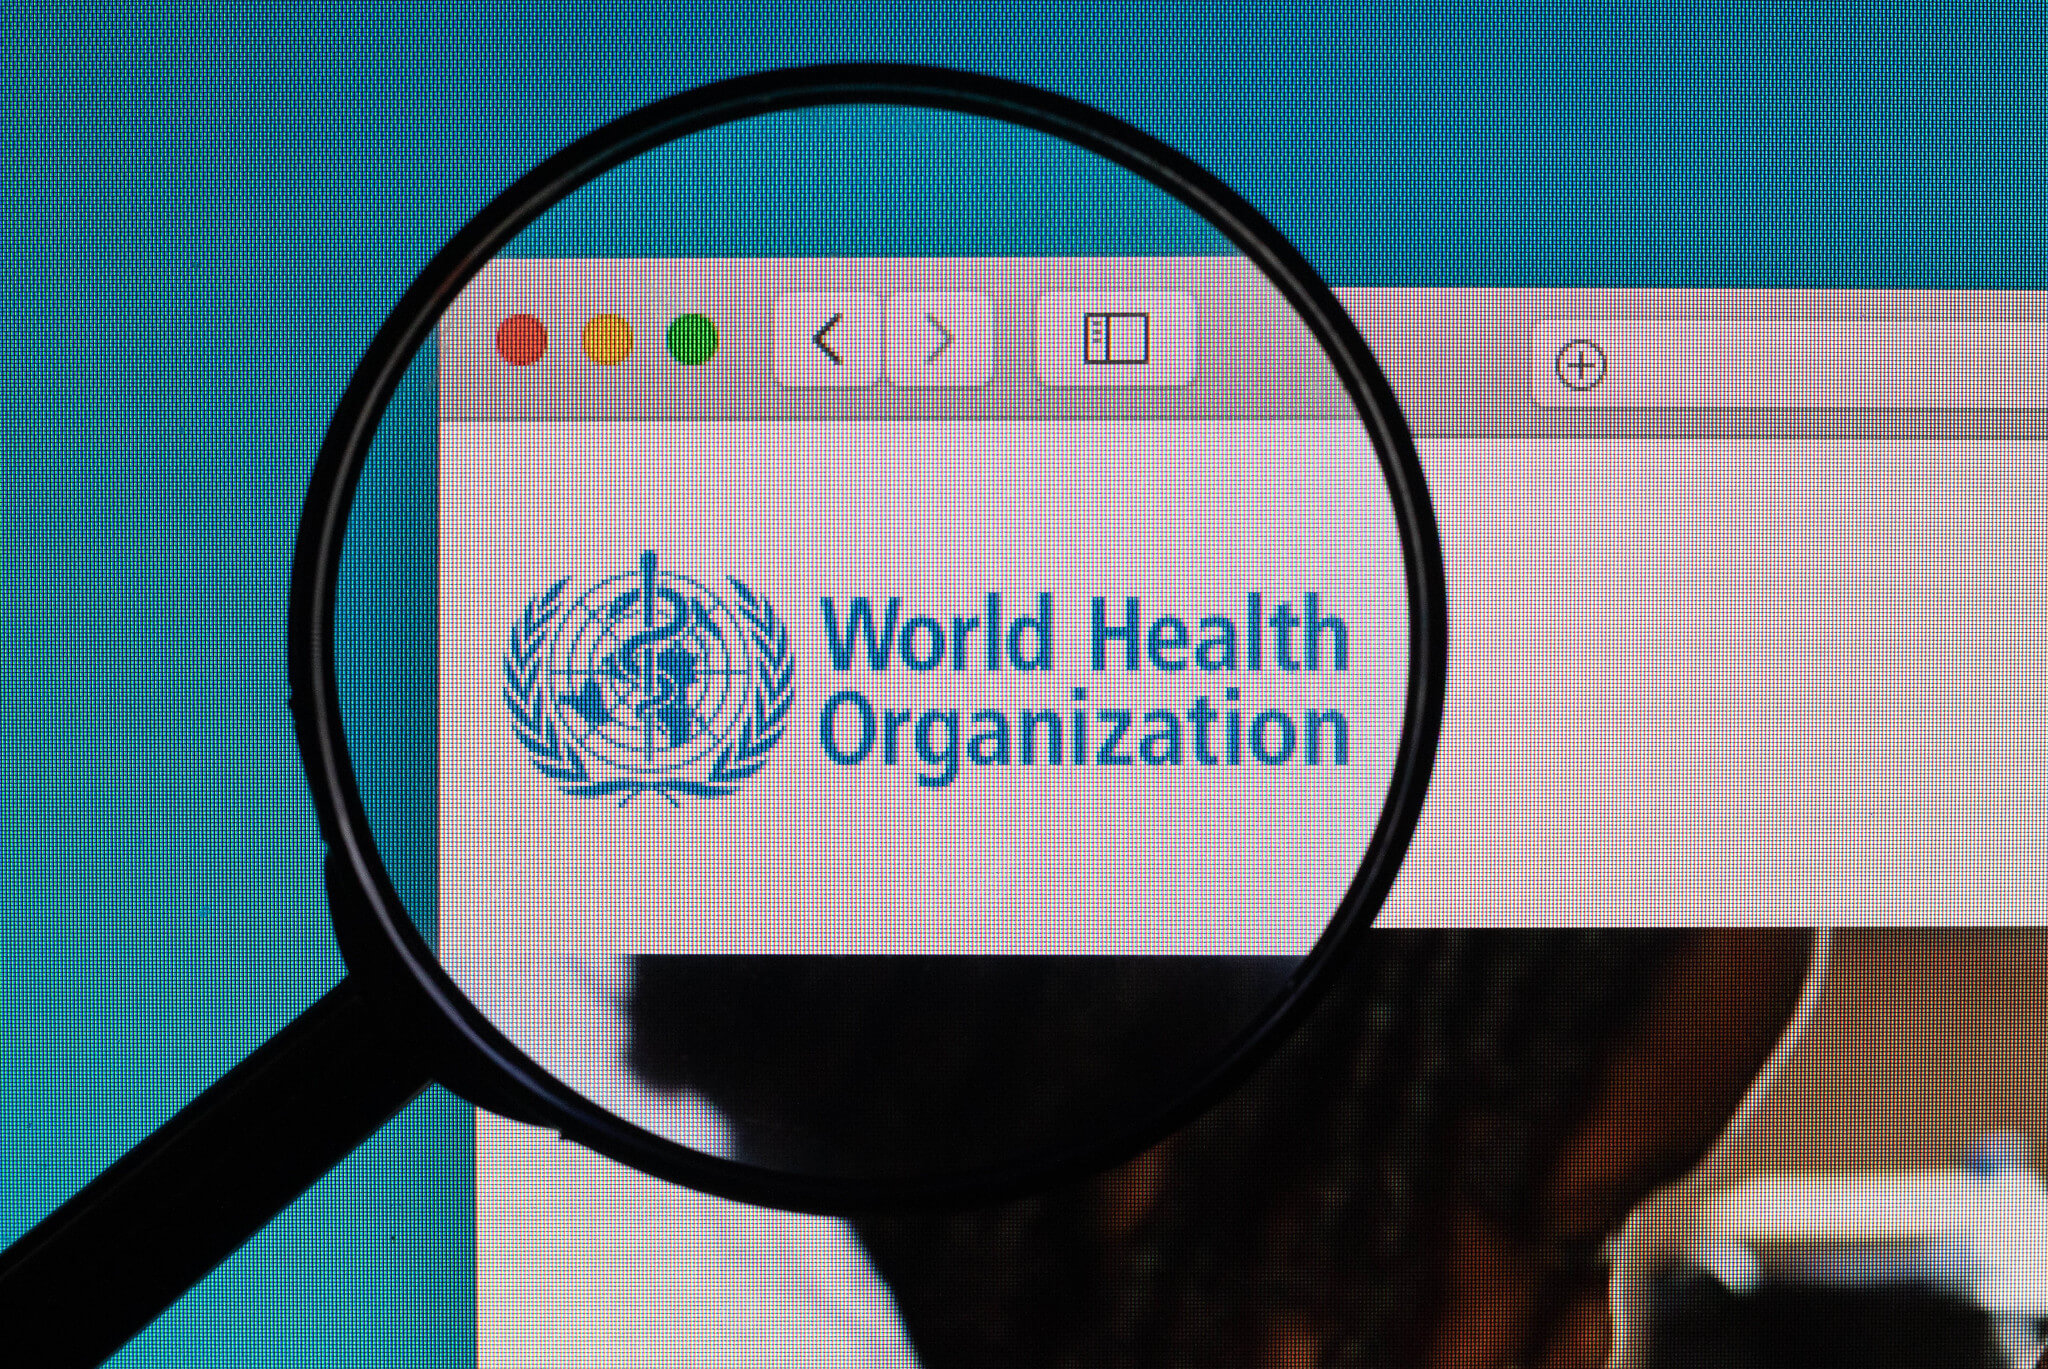 World Health organization logo under magnifying glass